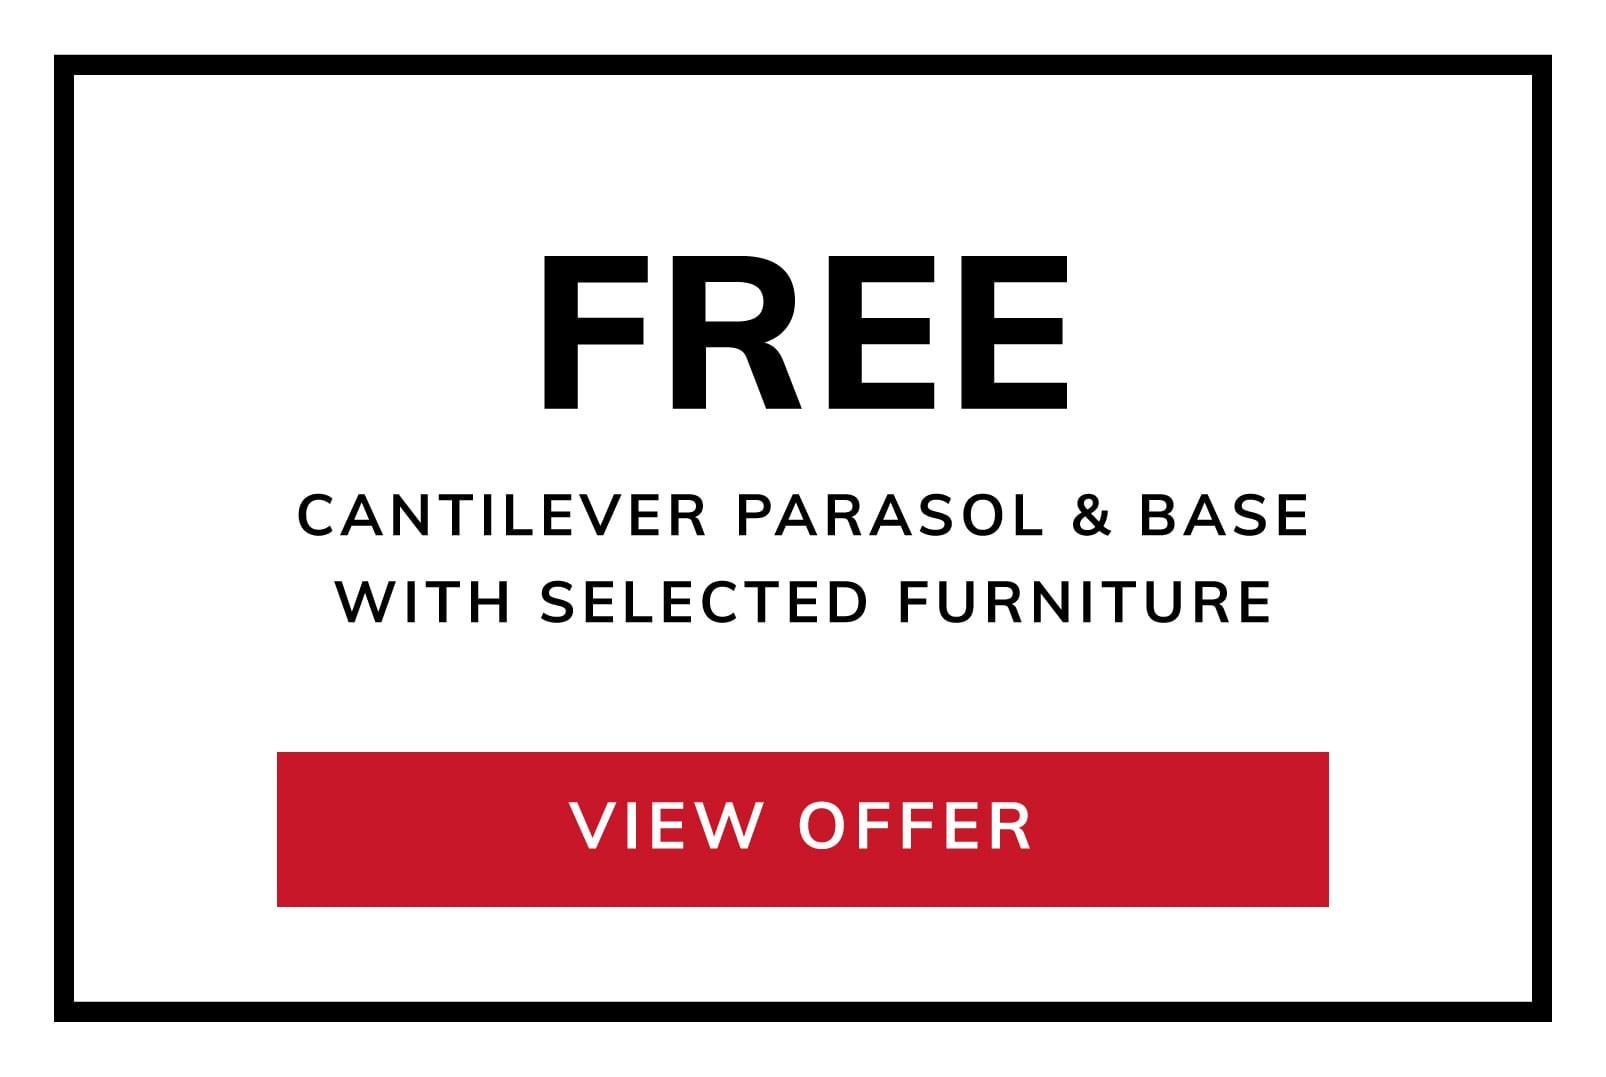 Free Cantilever Parasol & Base